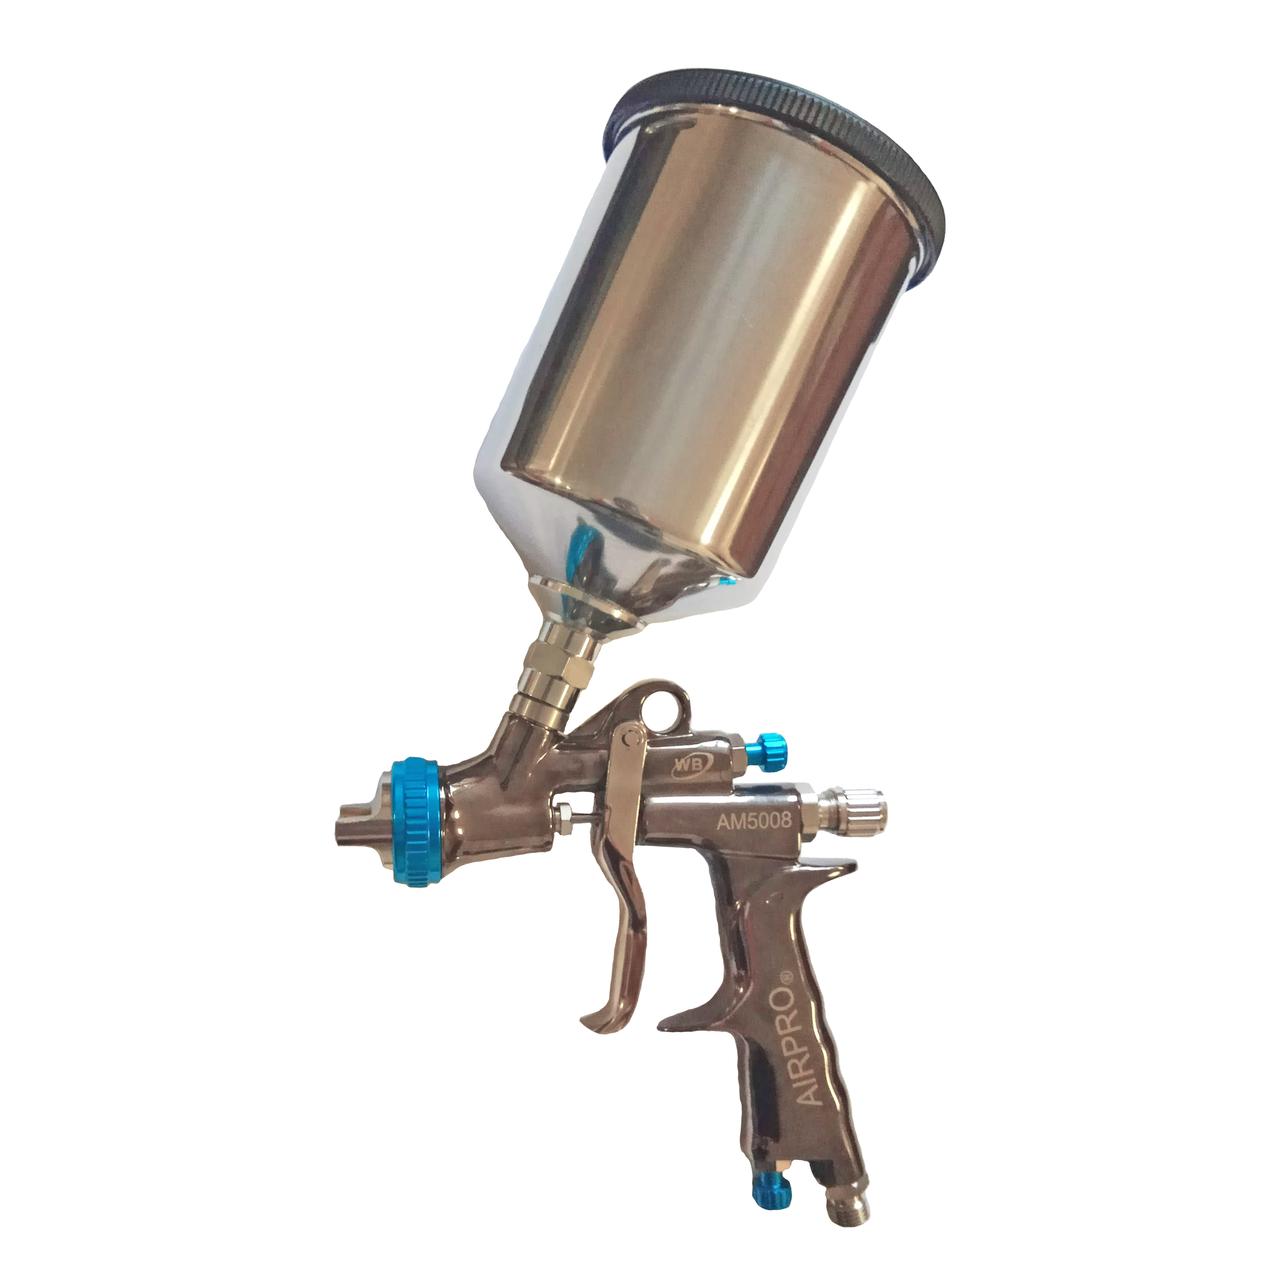 Краскопульт пневматический Air Pro AM5008 LVLP WB PLUS-AL (1,4 мм)